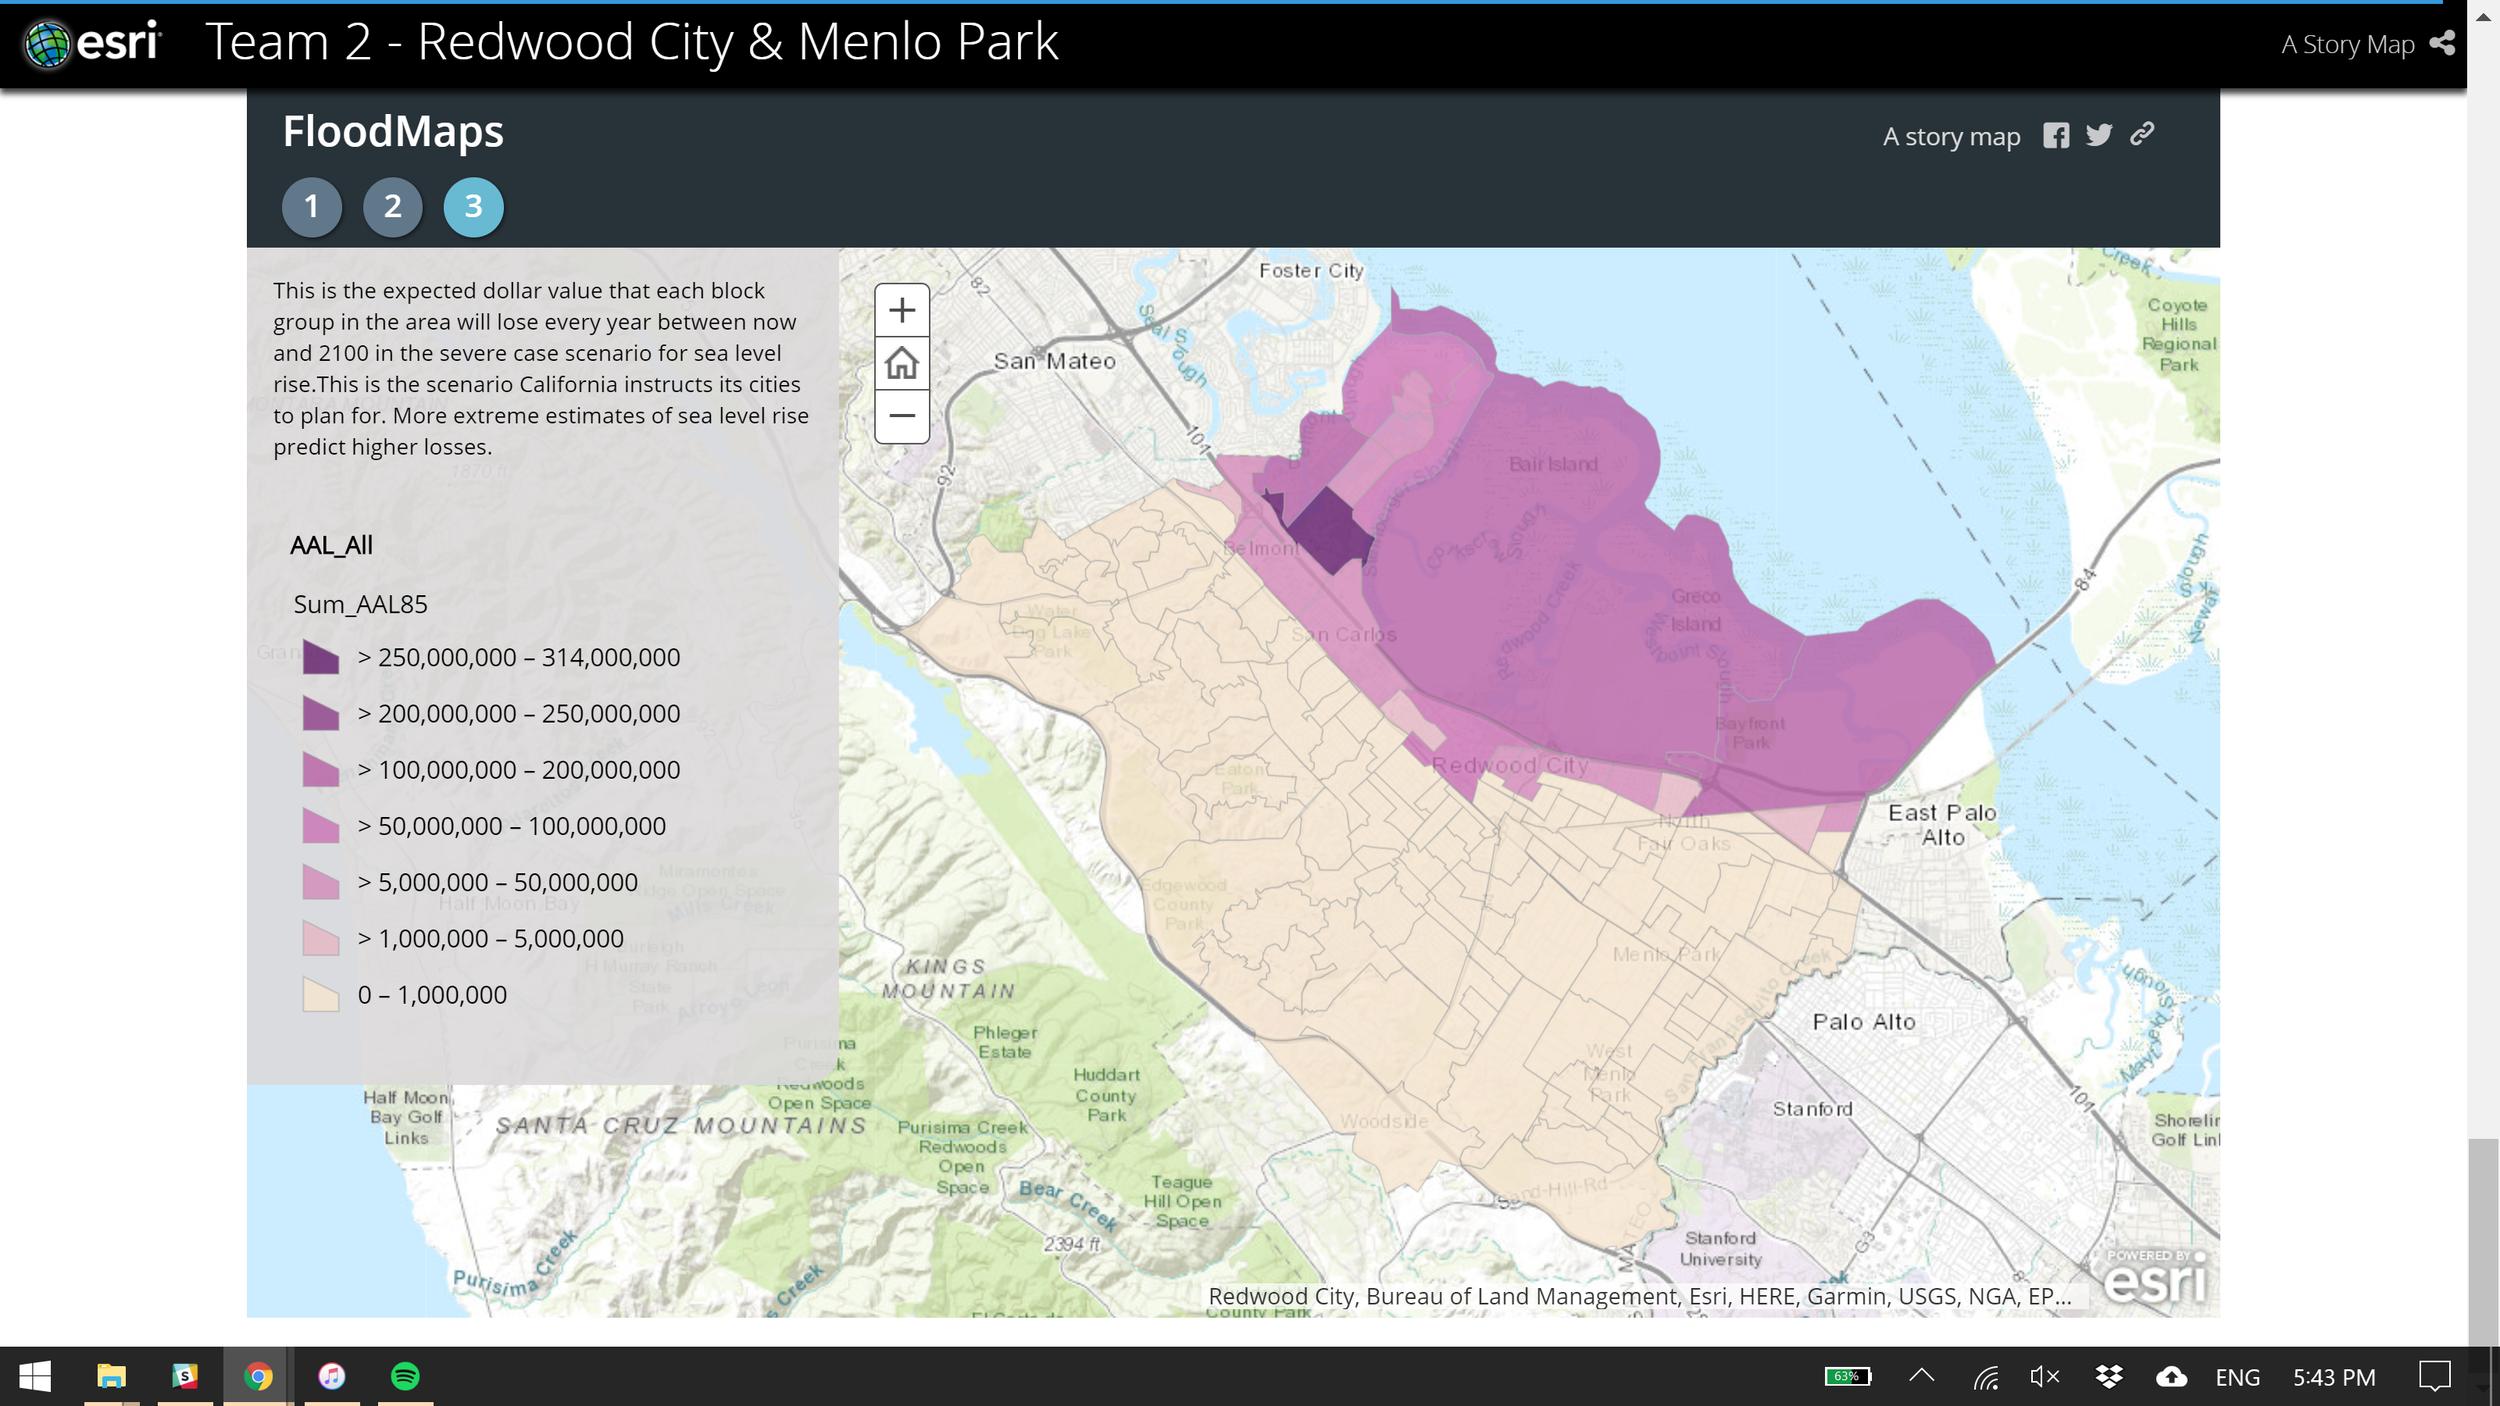 Team 2: Redwood City & Menlo Park